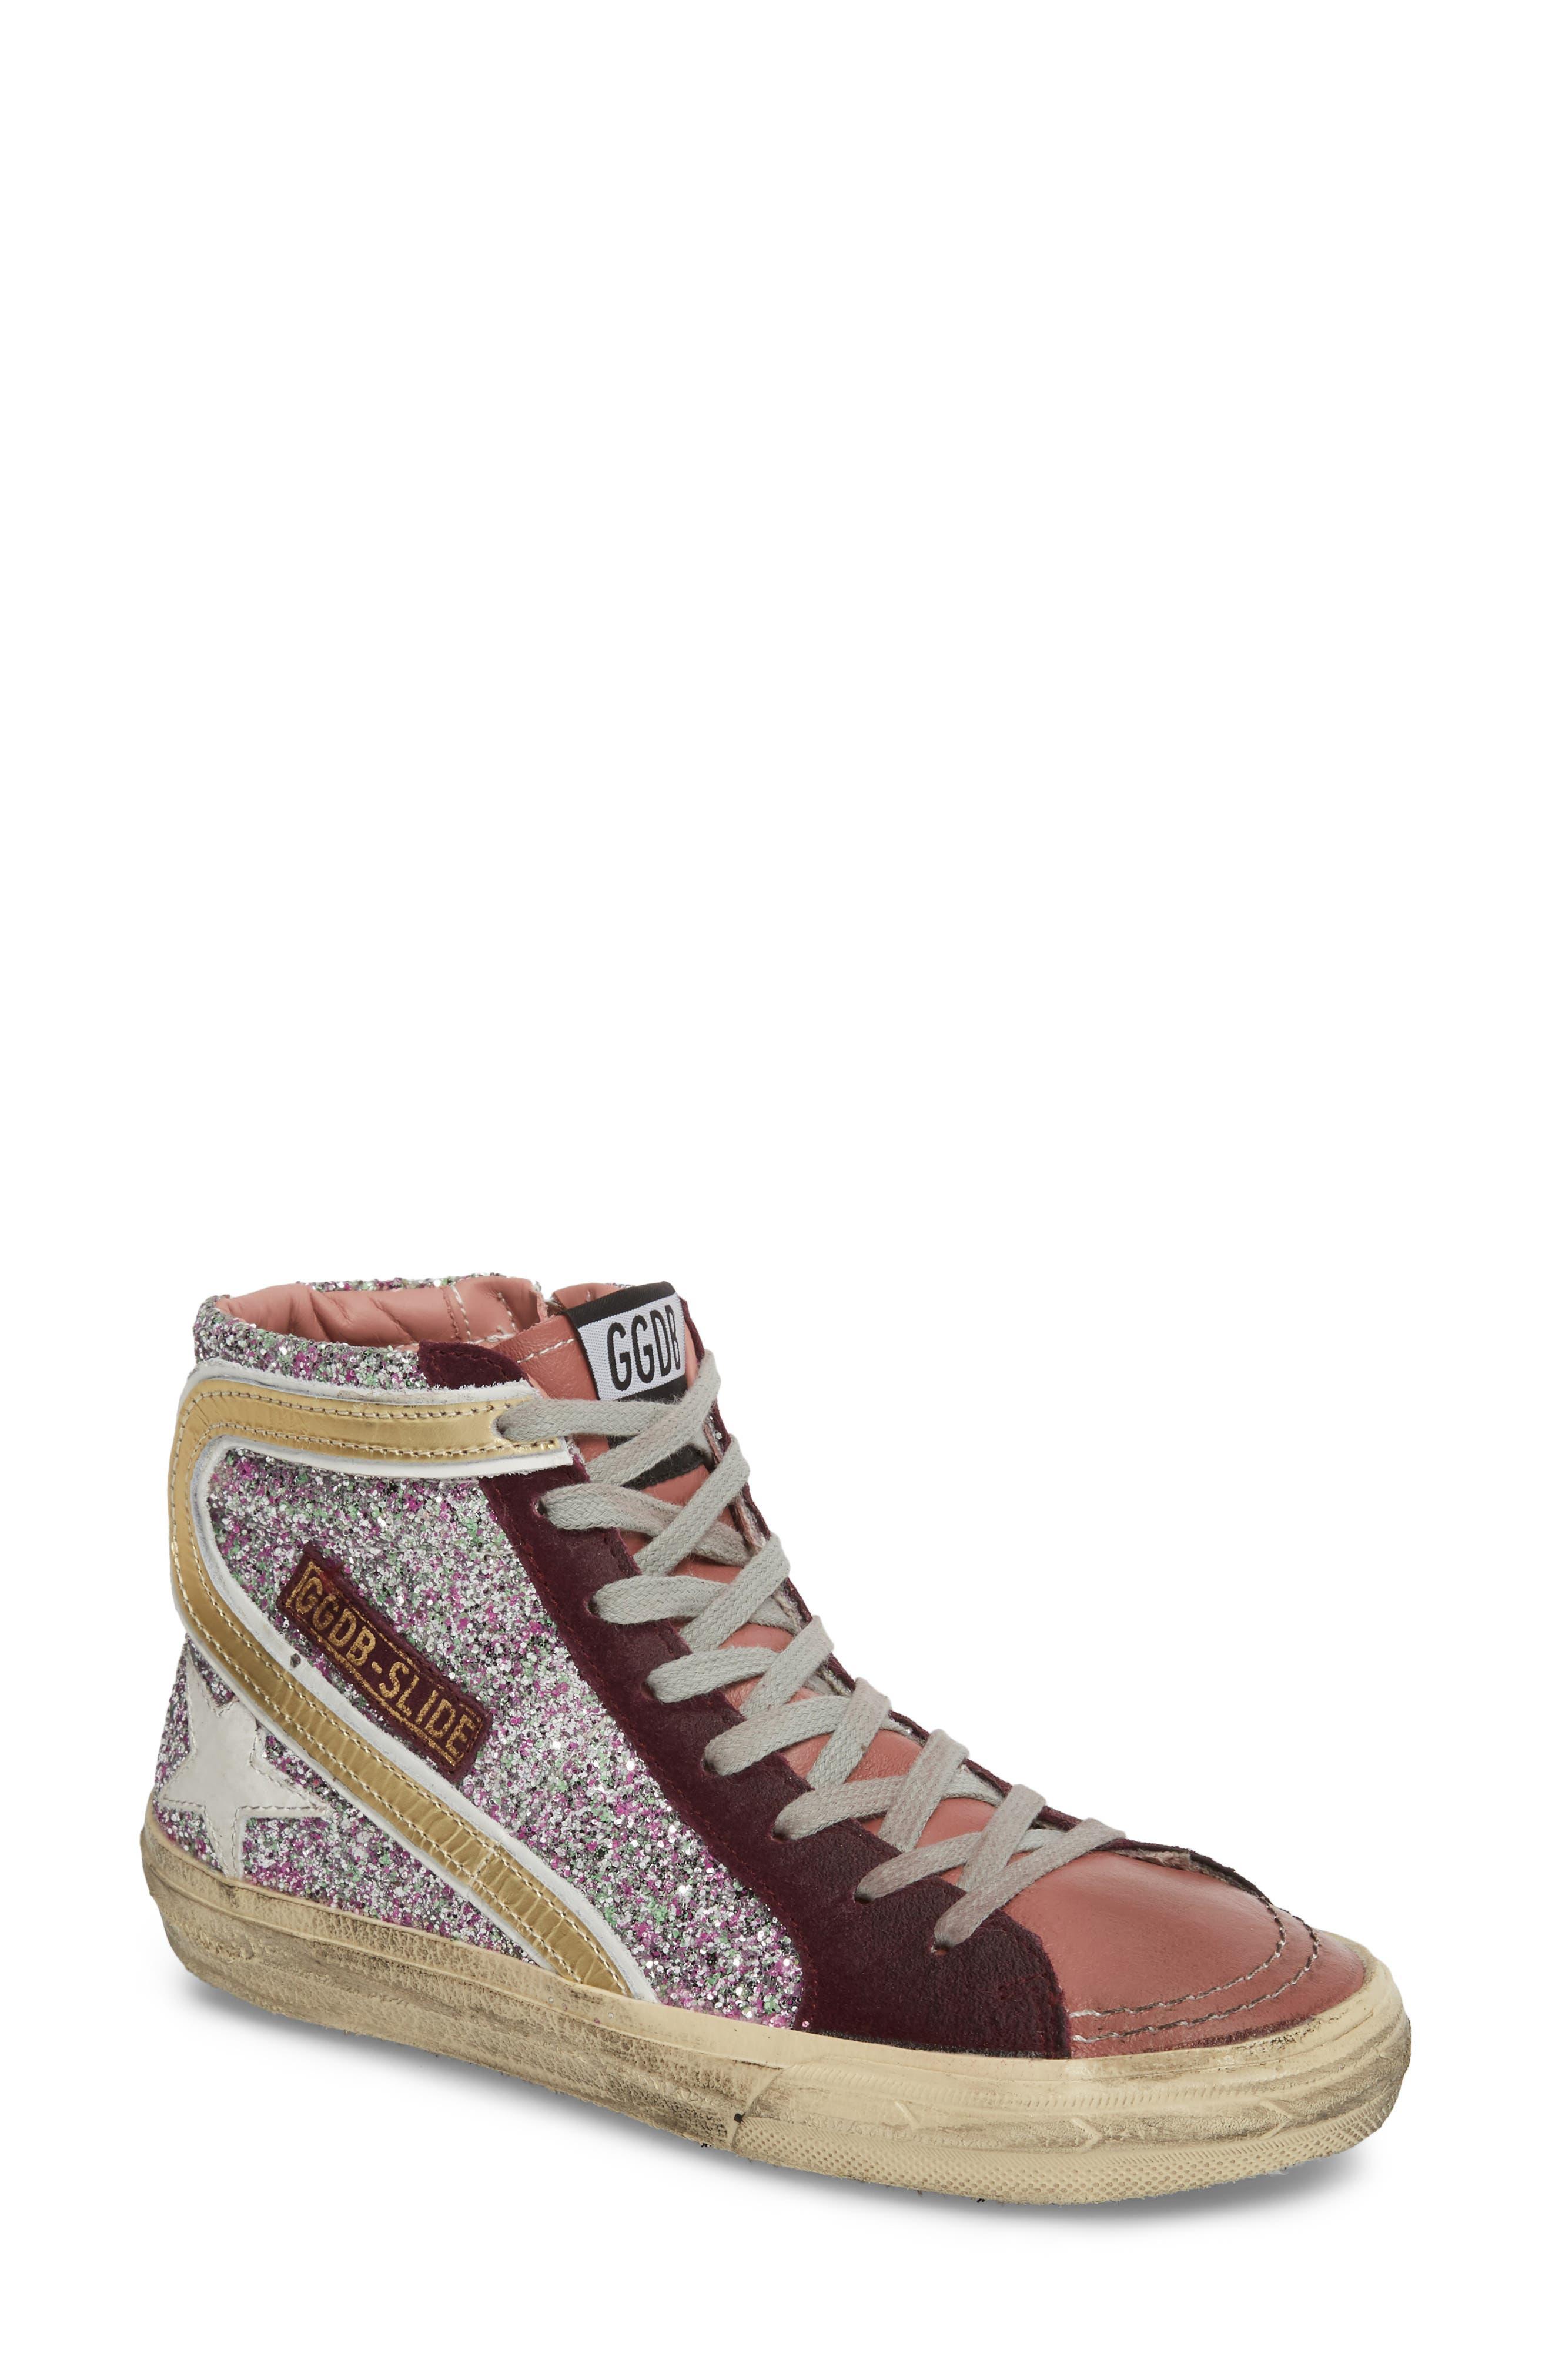 Slide High Top Sneaker,                         Main,                         color, Bordeaux / Pink/ Gold